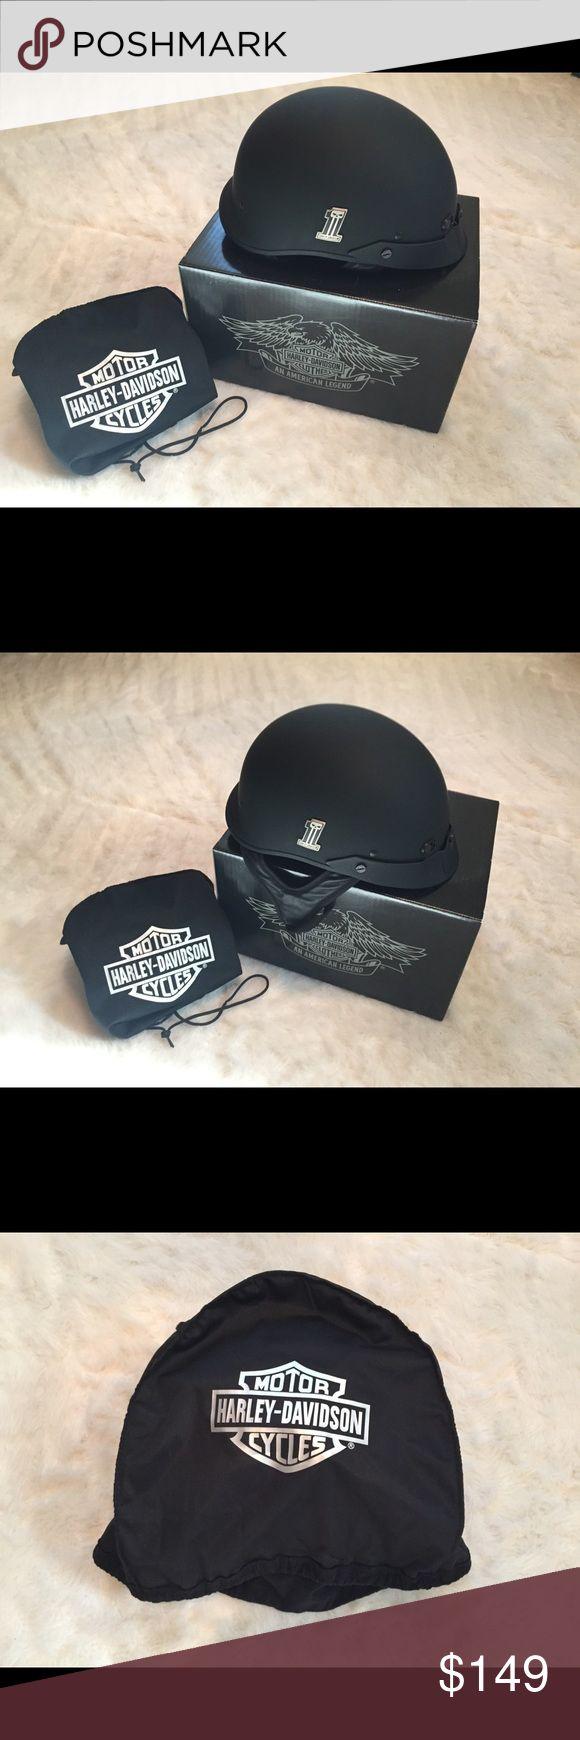 Harley-Davidson Half-Spoiler Motorradhelm Excellent Used Condition (EUC) (a …   – My Posh Picks